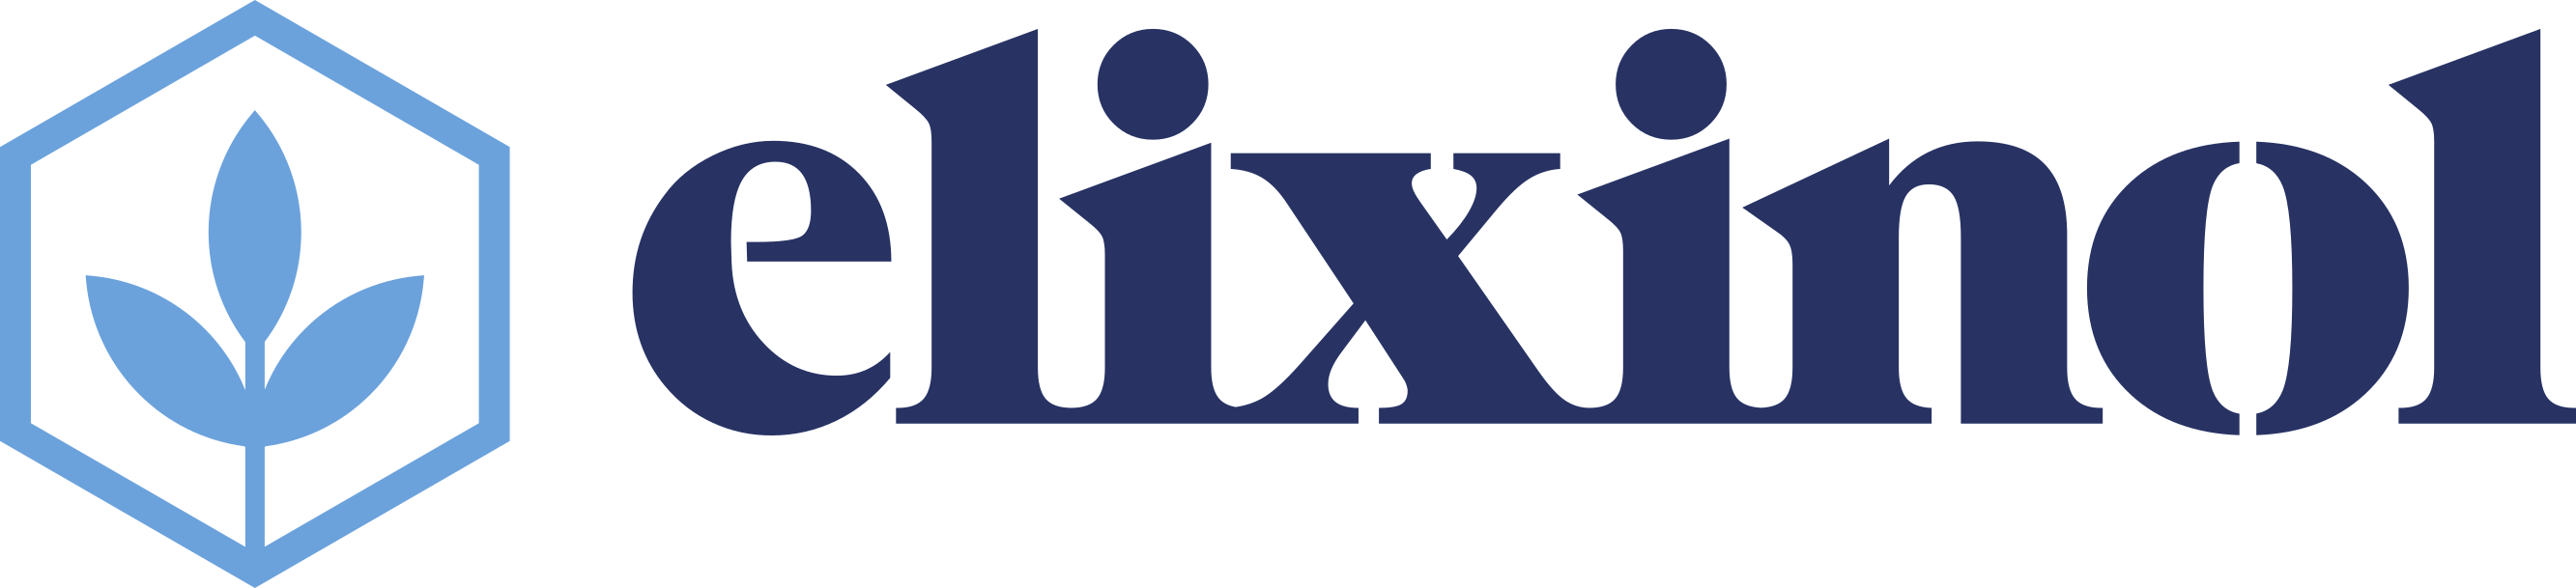 Elixinol AssetRepo Logomark Blue